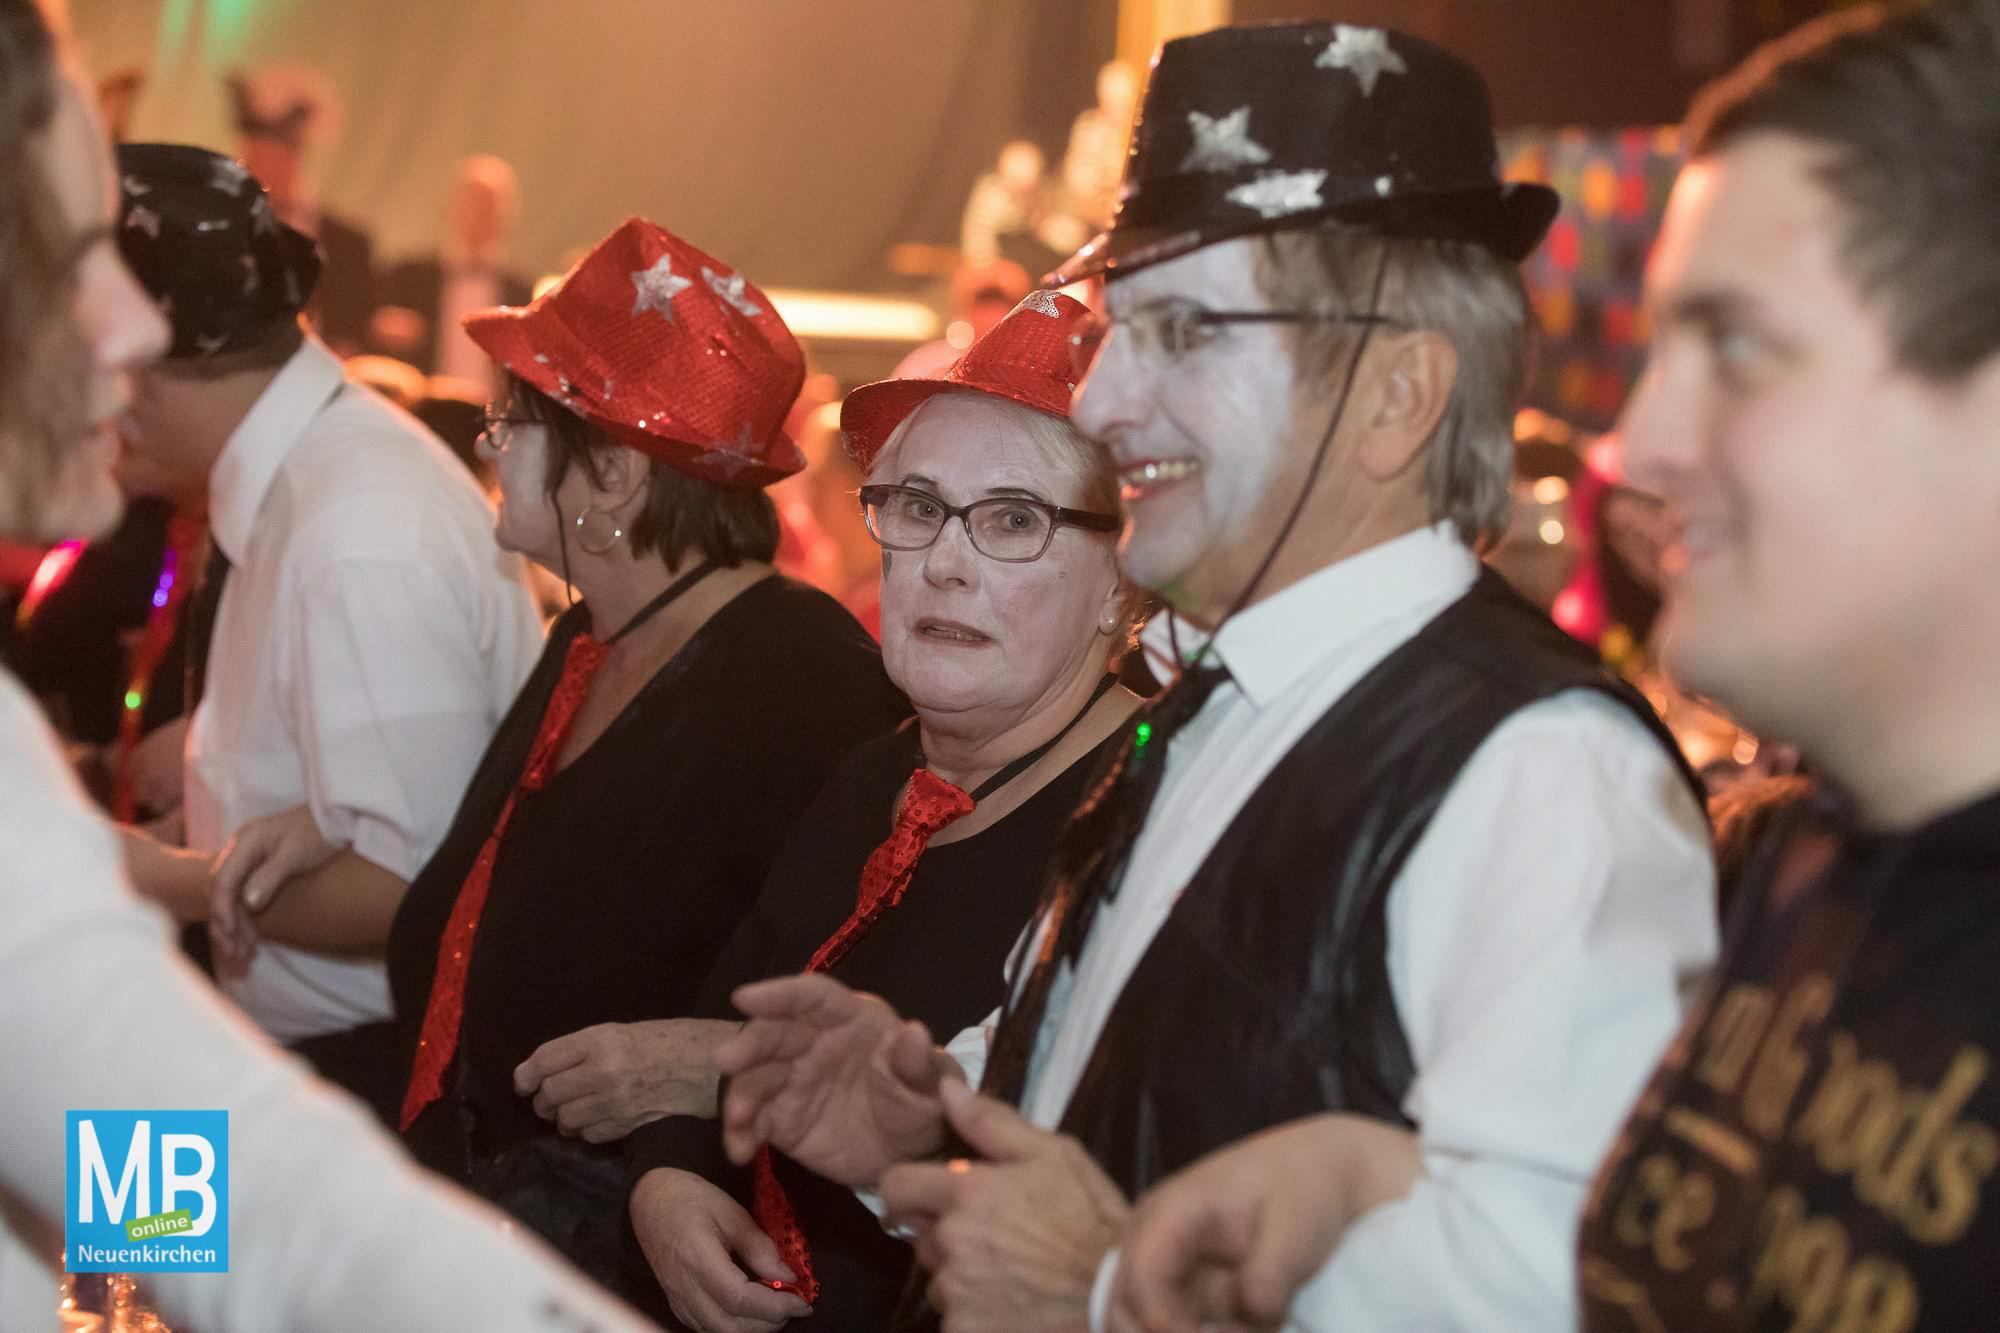 Karneval im Heithoek 2017